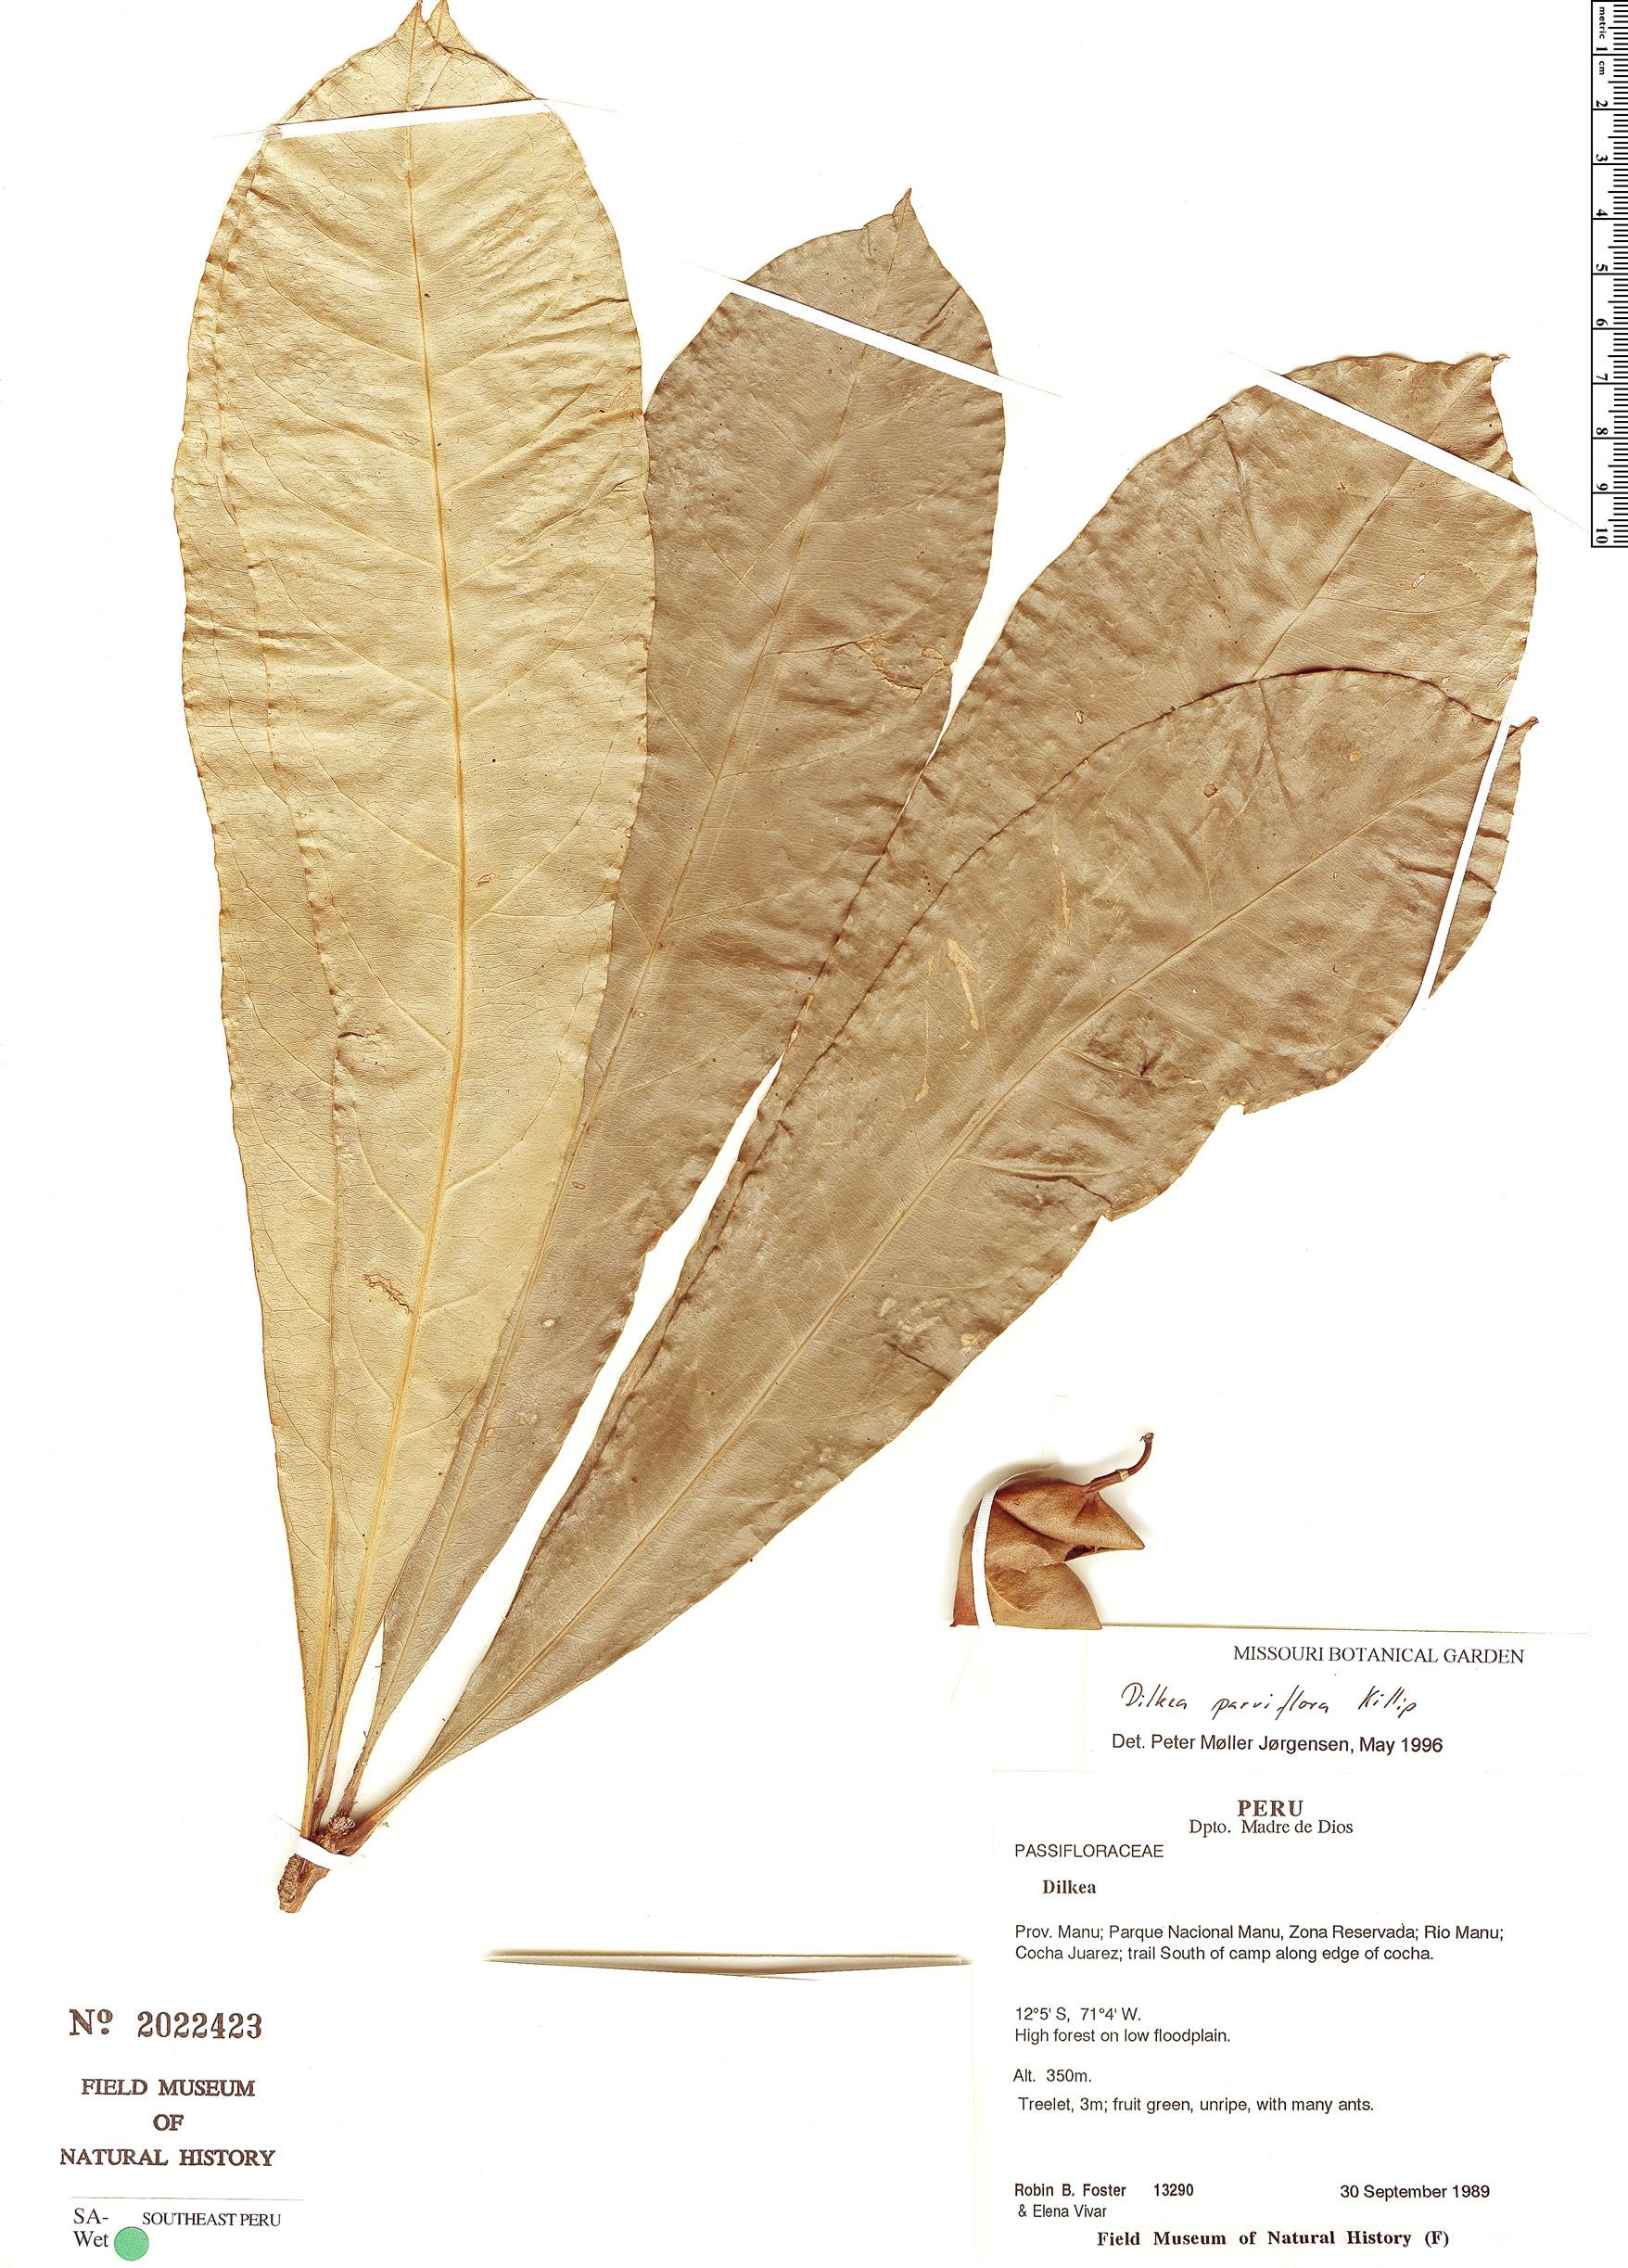 Specimen: Dilkea parviflora